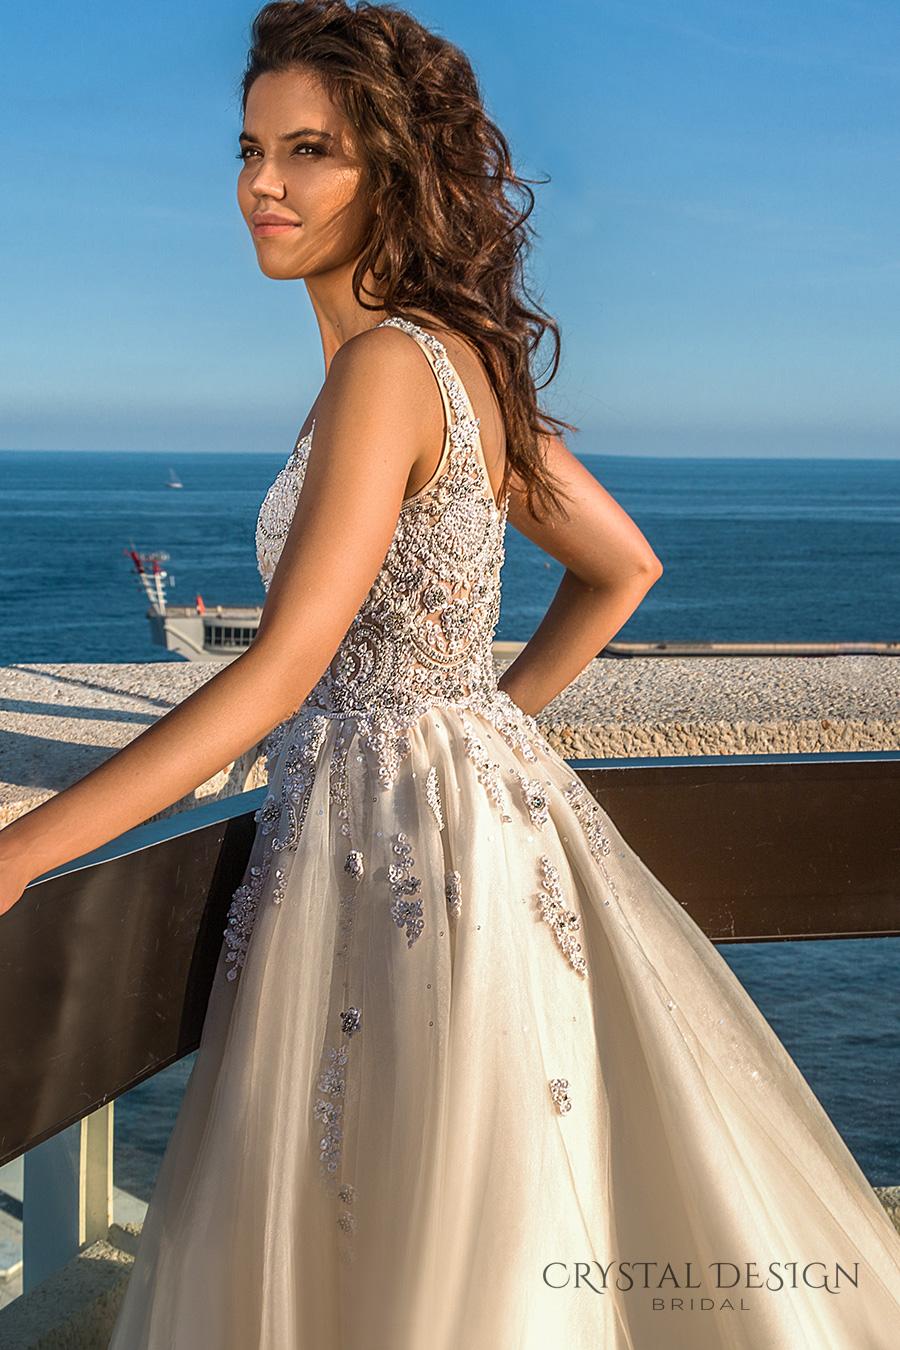 crystal-design-2017-bridal-sleeveless-with-strap-scoop-necklne-heavily-embellished-bodice-romantic-a-line-wedding-dress-scoop-back-royal-long-train-carven-zsdv